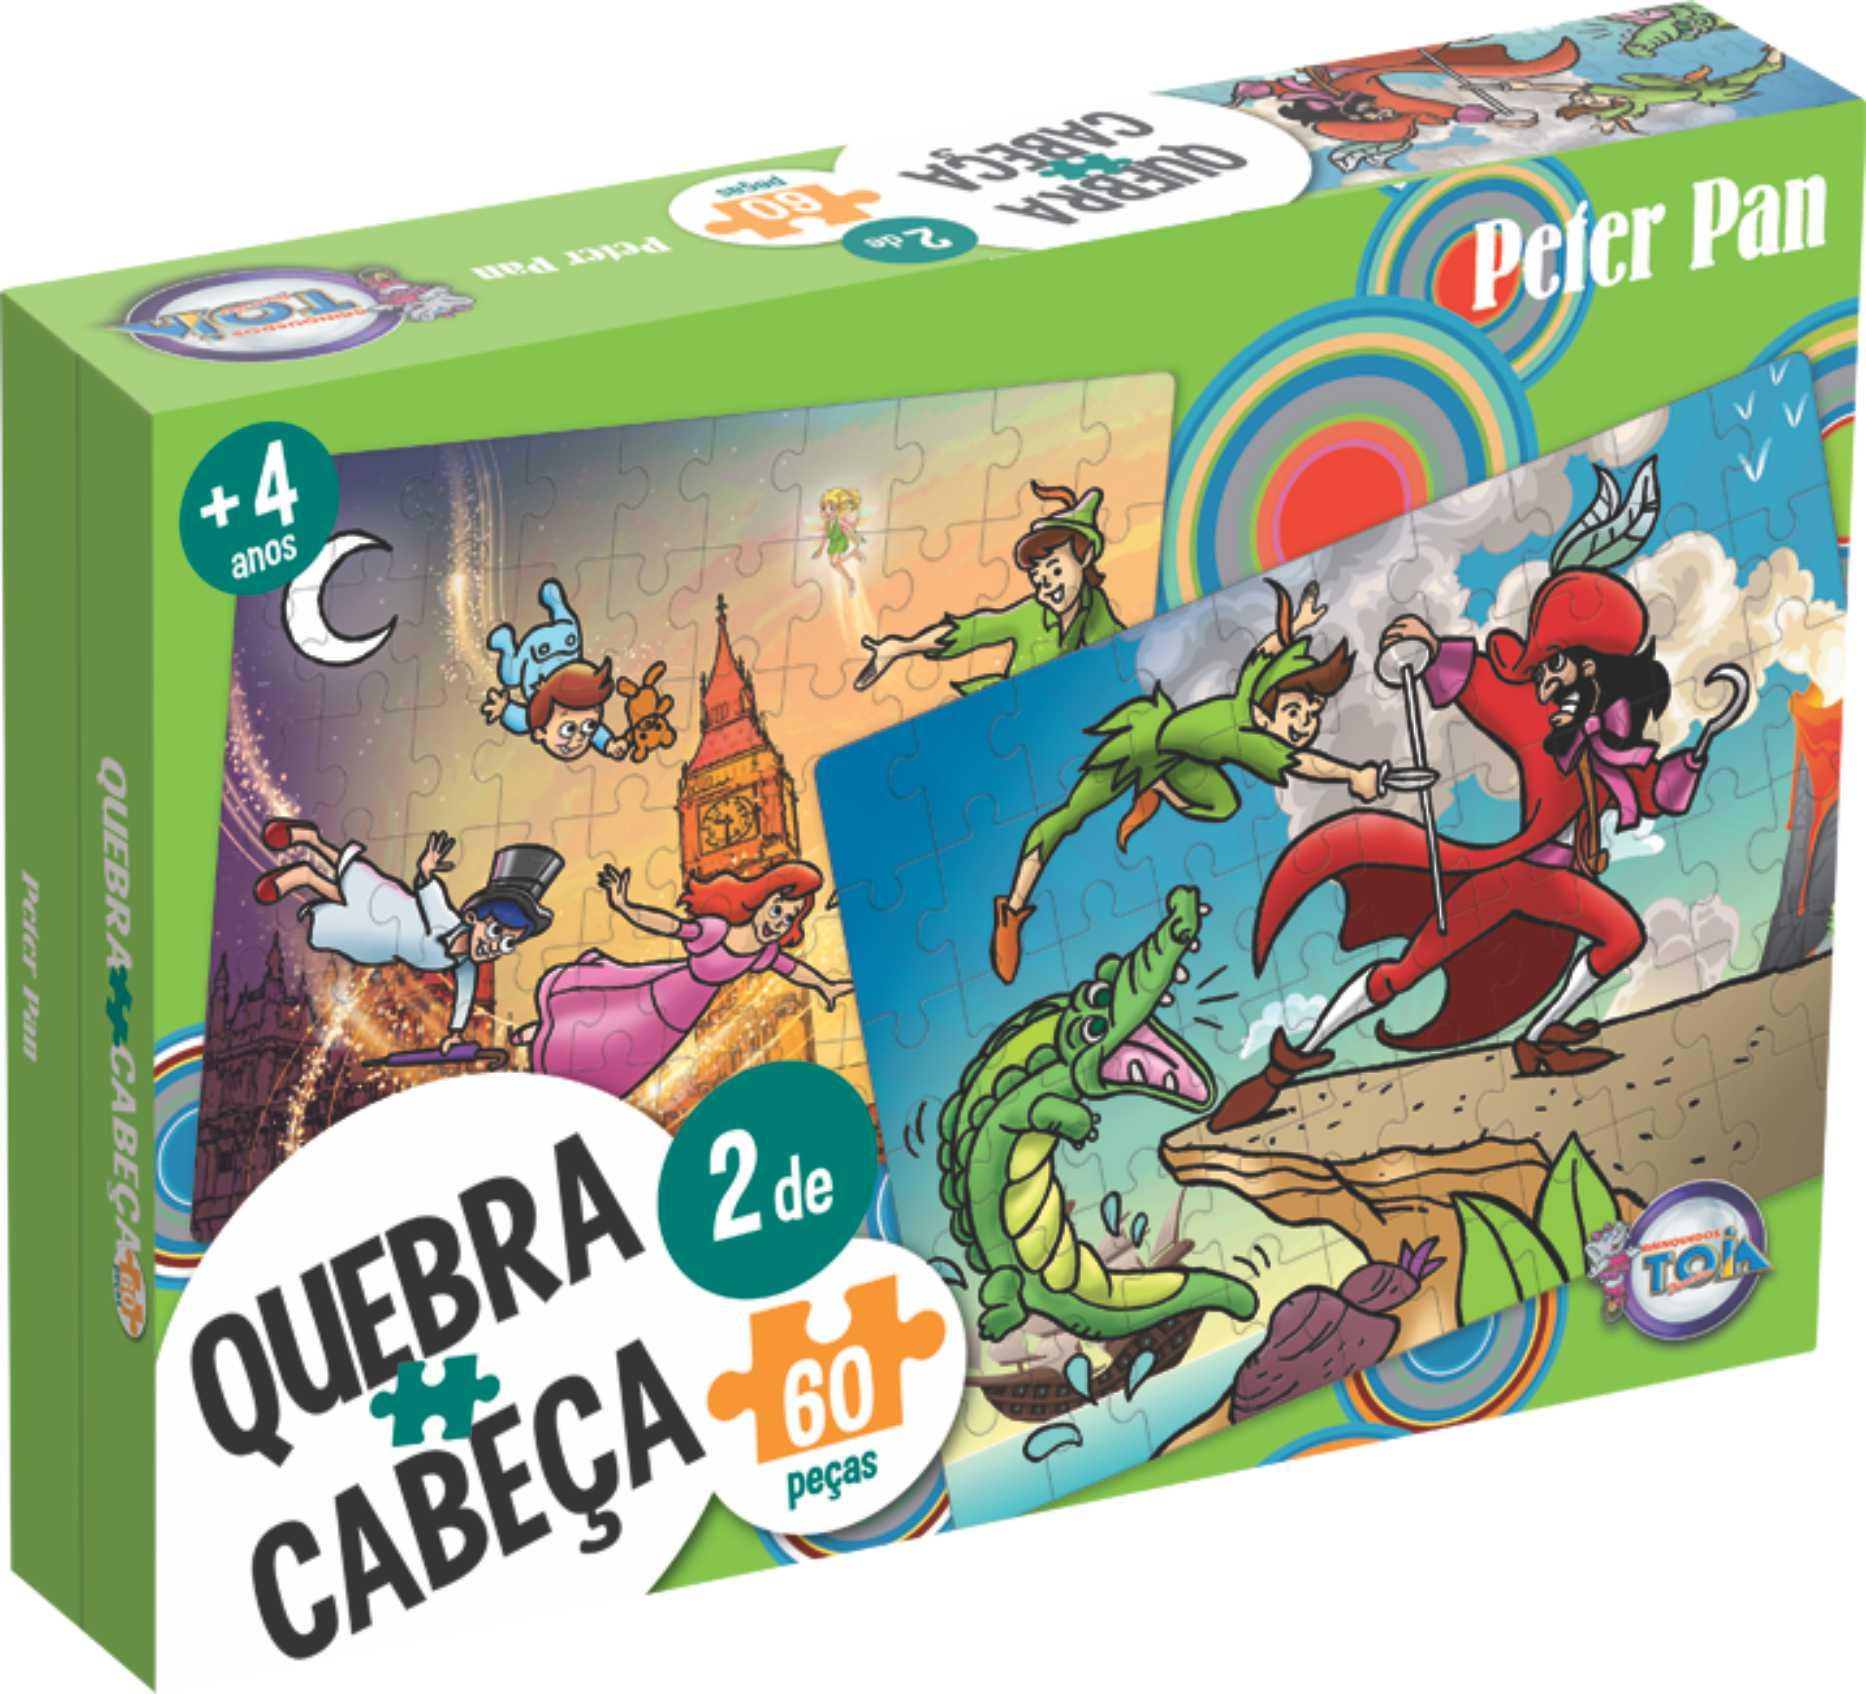 Puzzle Peter Pan - 60 Peças / idade + 4 anos.